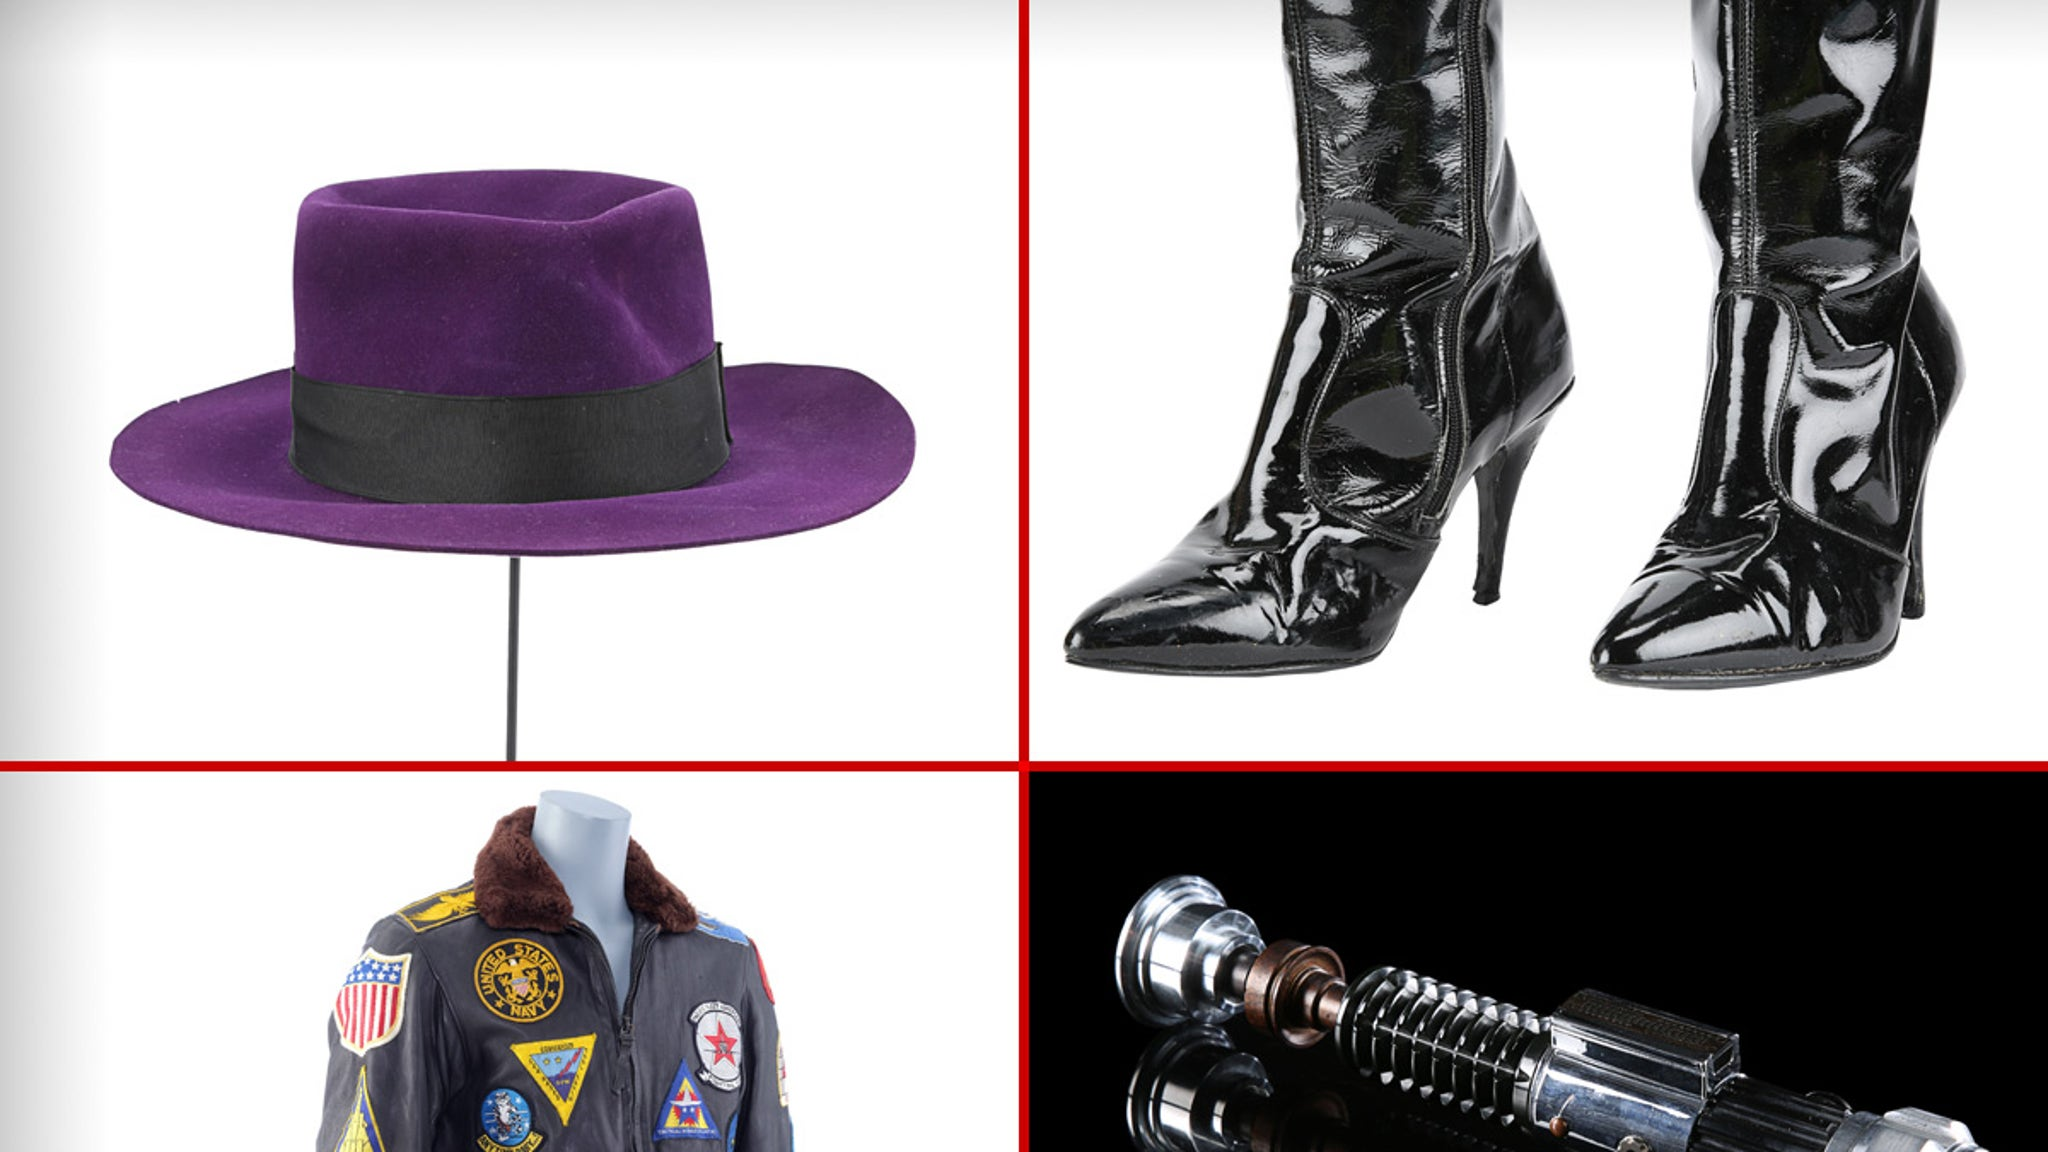 Joker's Fedora from 'Batman,' 'Star Wars' Lightsaber & More in $5.6 Mil Auction -